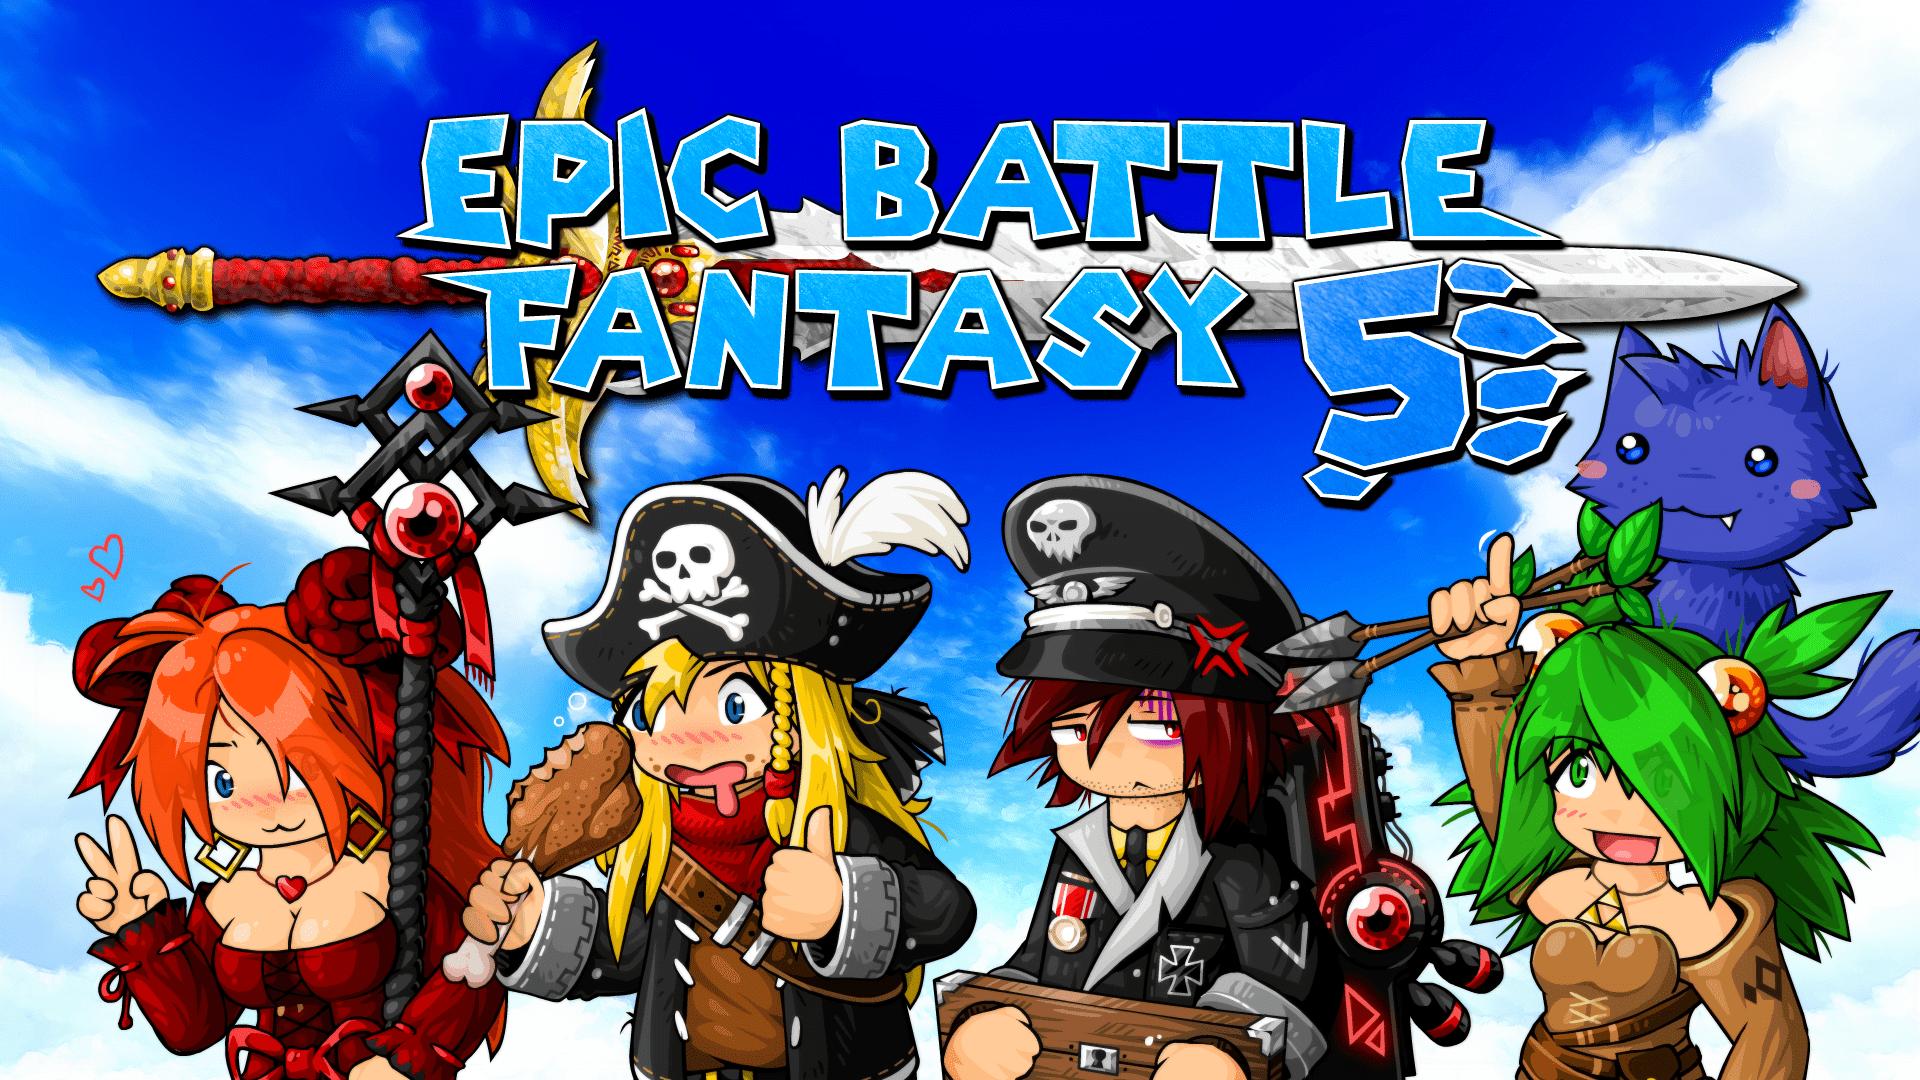 Epic Battle Fantasy 5 Full Version Free Download · FrontLine Gaming